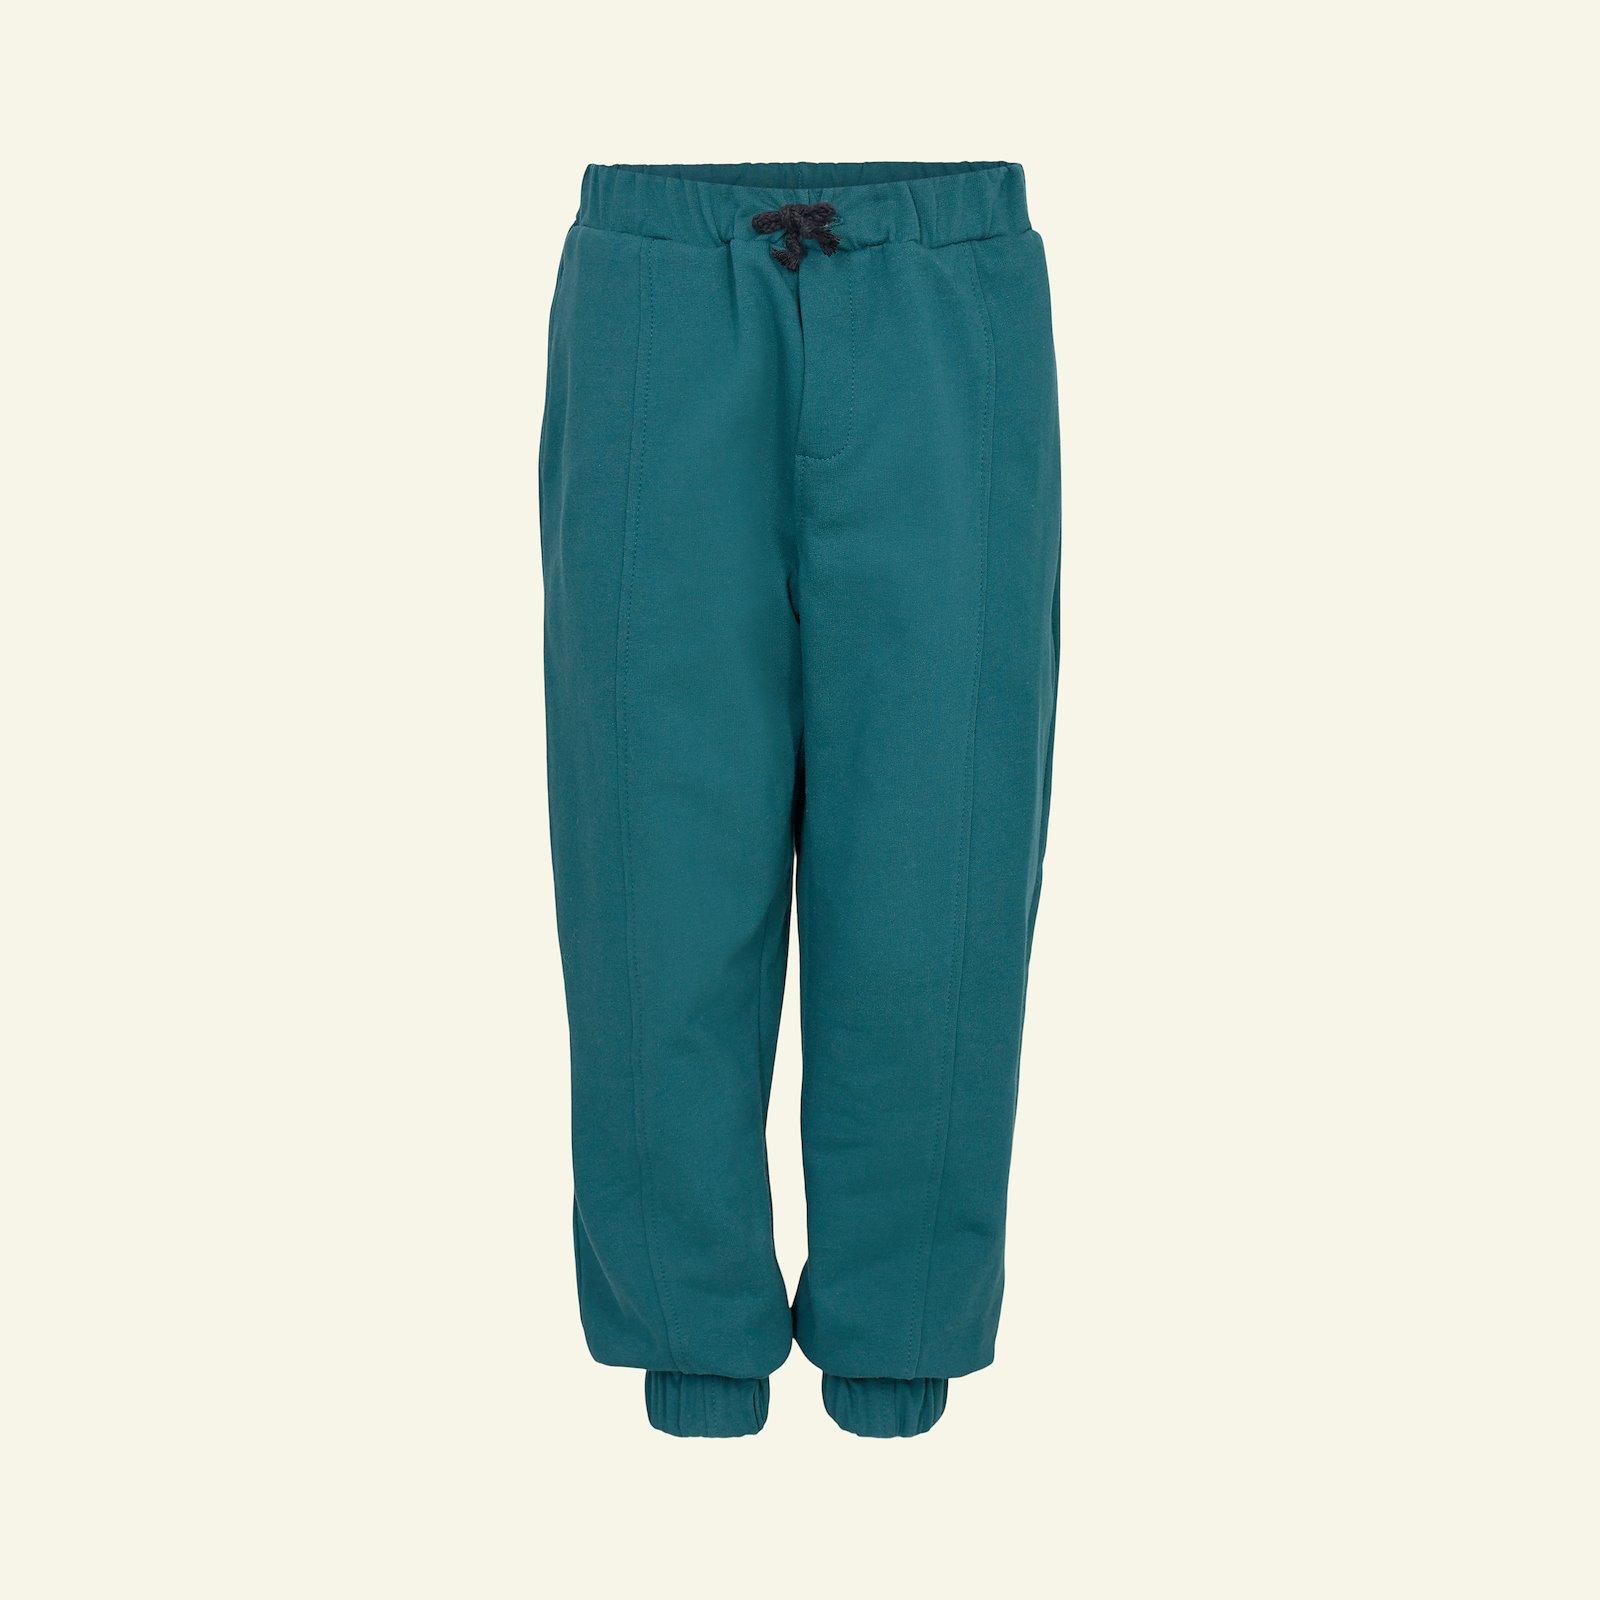 Sweat pants, 110/5y p60040_211775_75243_sskit